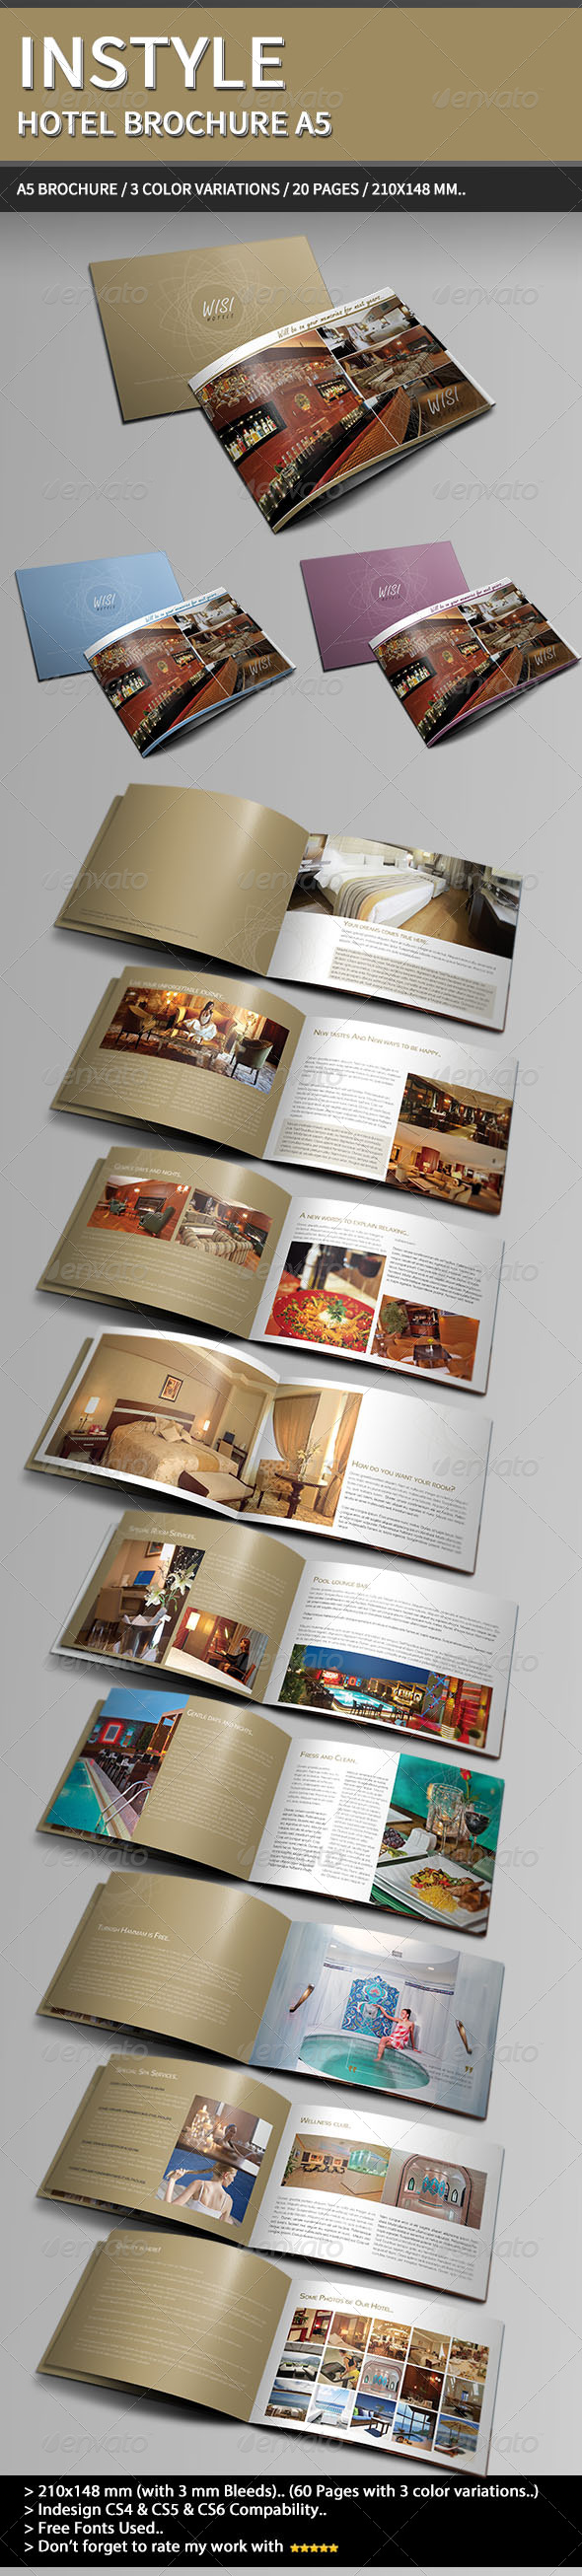 InStyle Hotel Brochure A5.. - Informational Brochures